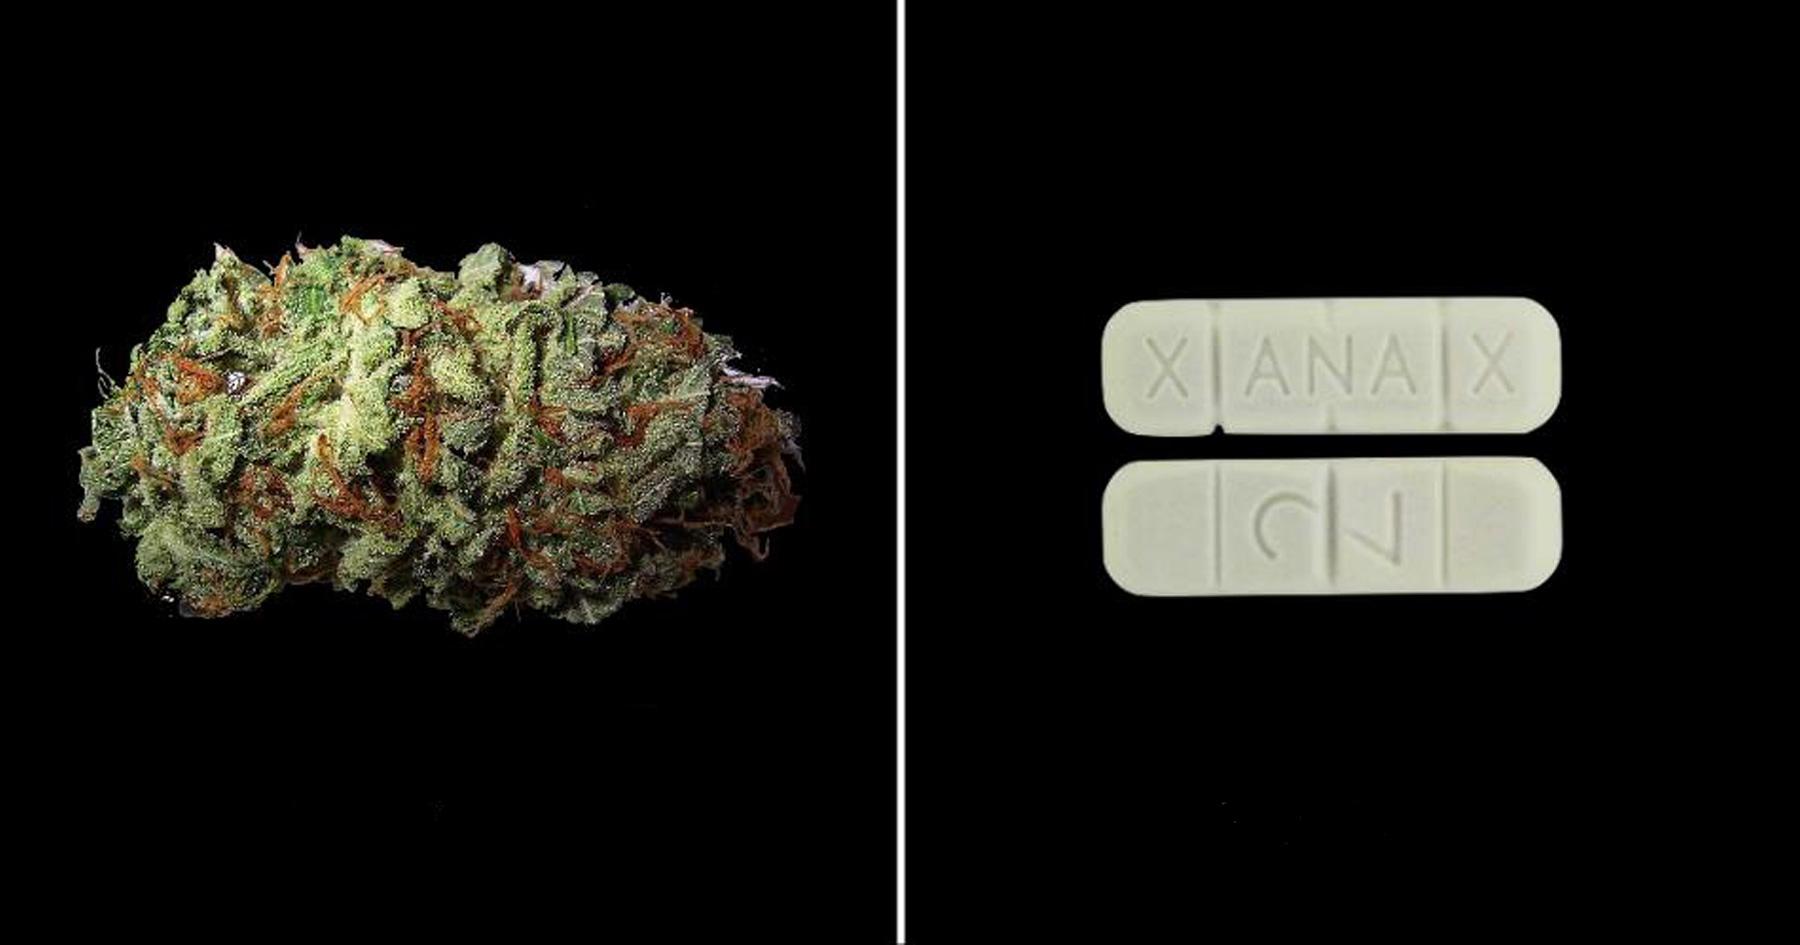 xanax no prescription drug